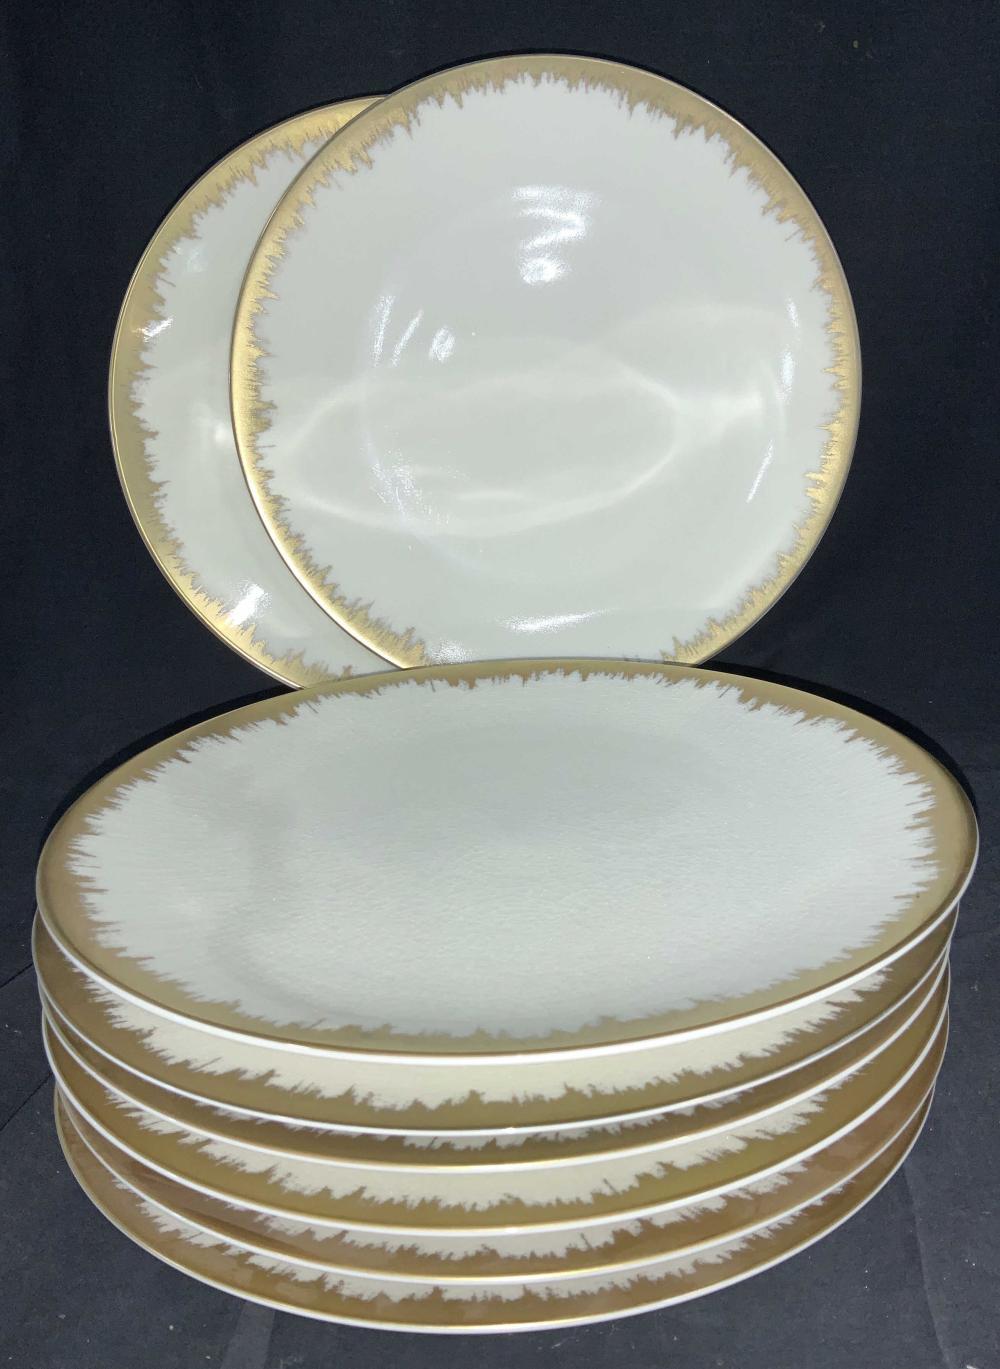 Kim Seybert SHAKTI Aura Opal Gold Brush Chargers,8